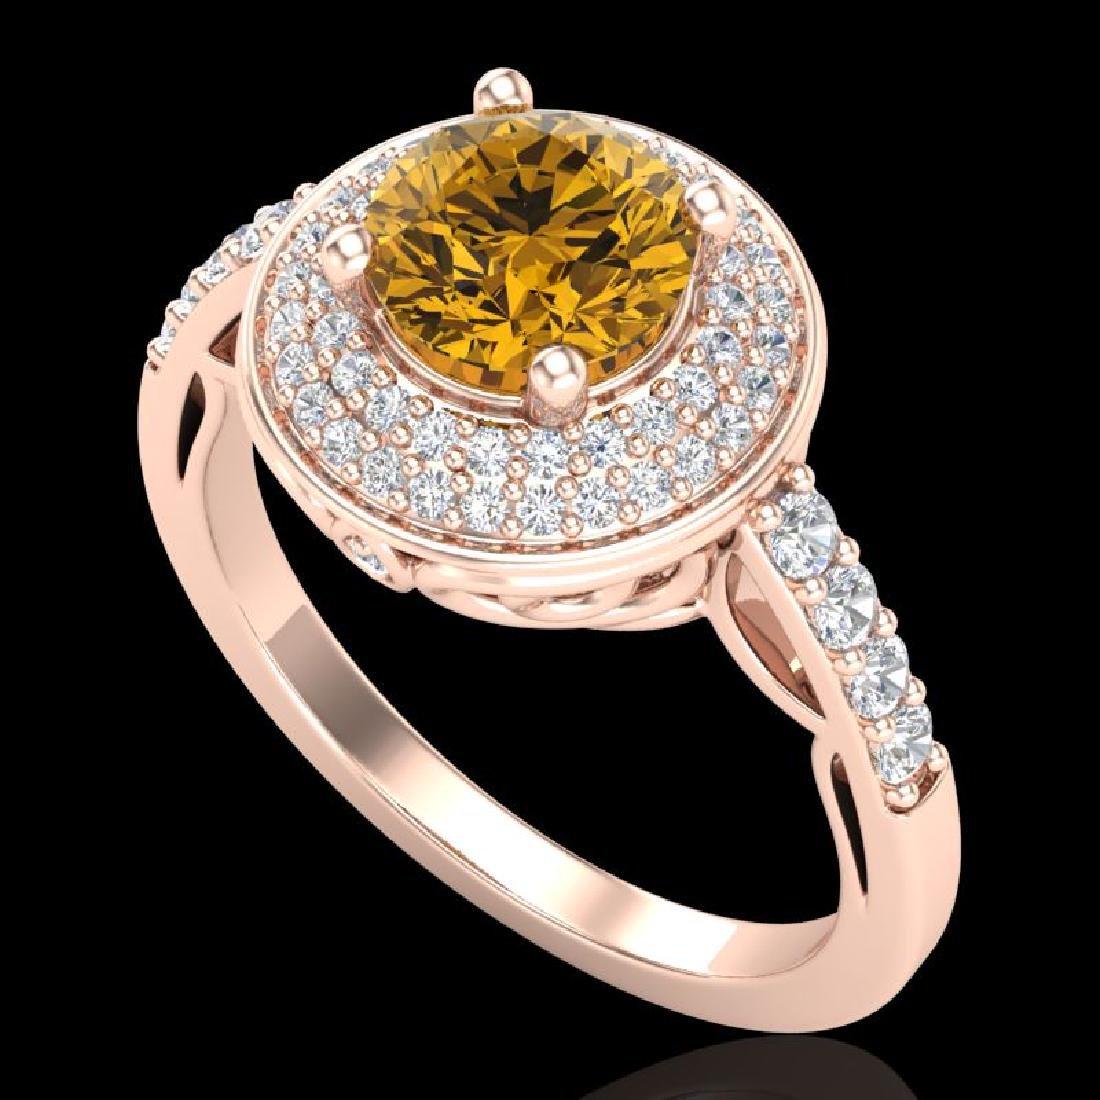 1.7 CTW Intense Fancy Yellow Diamond Engagement Art